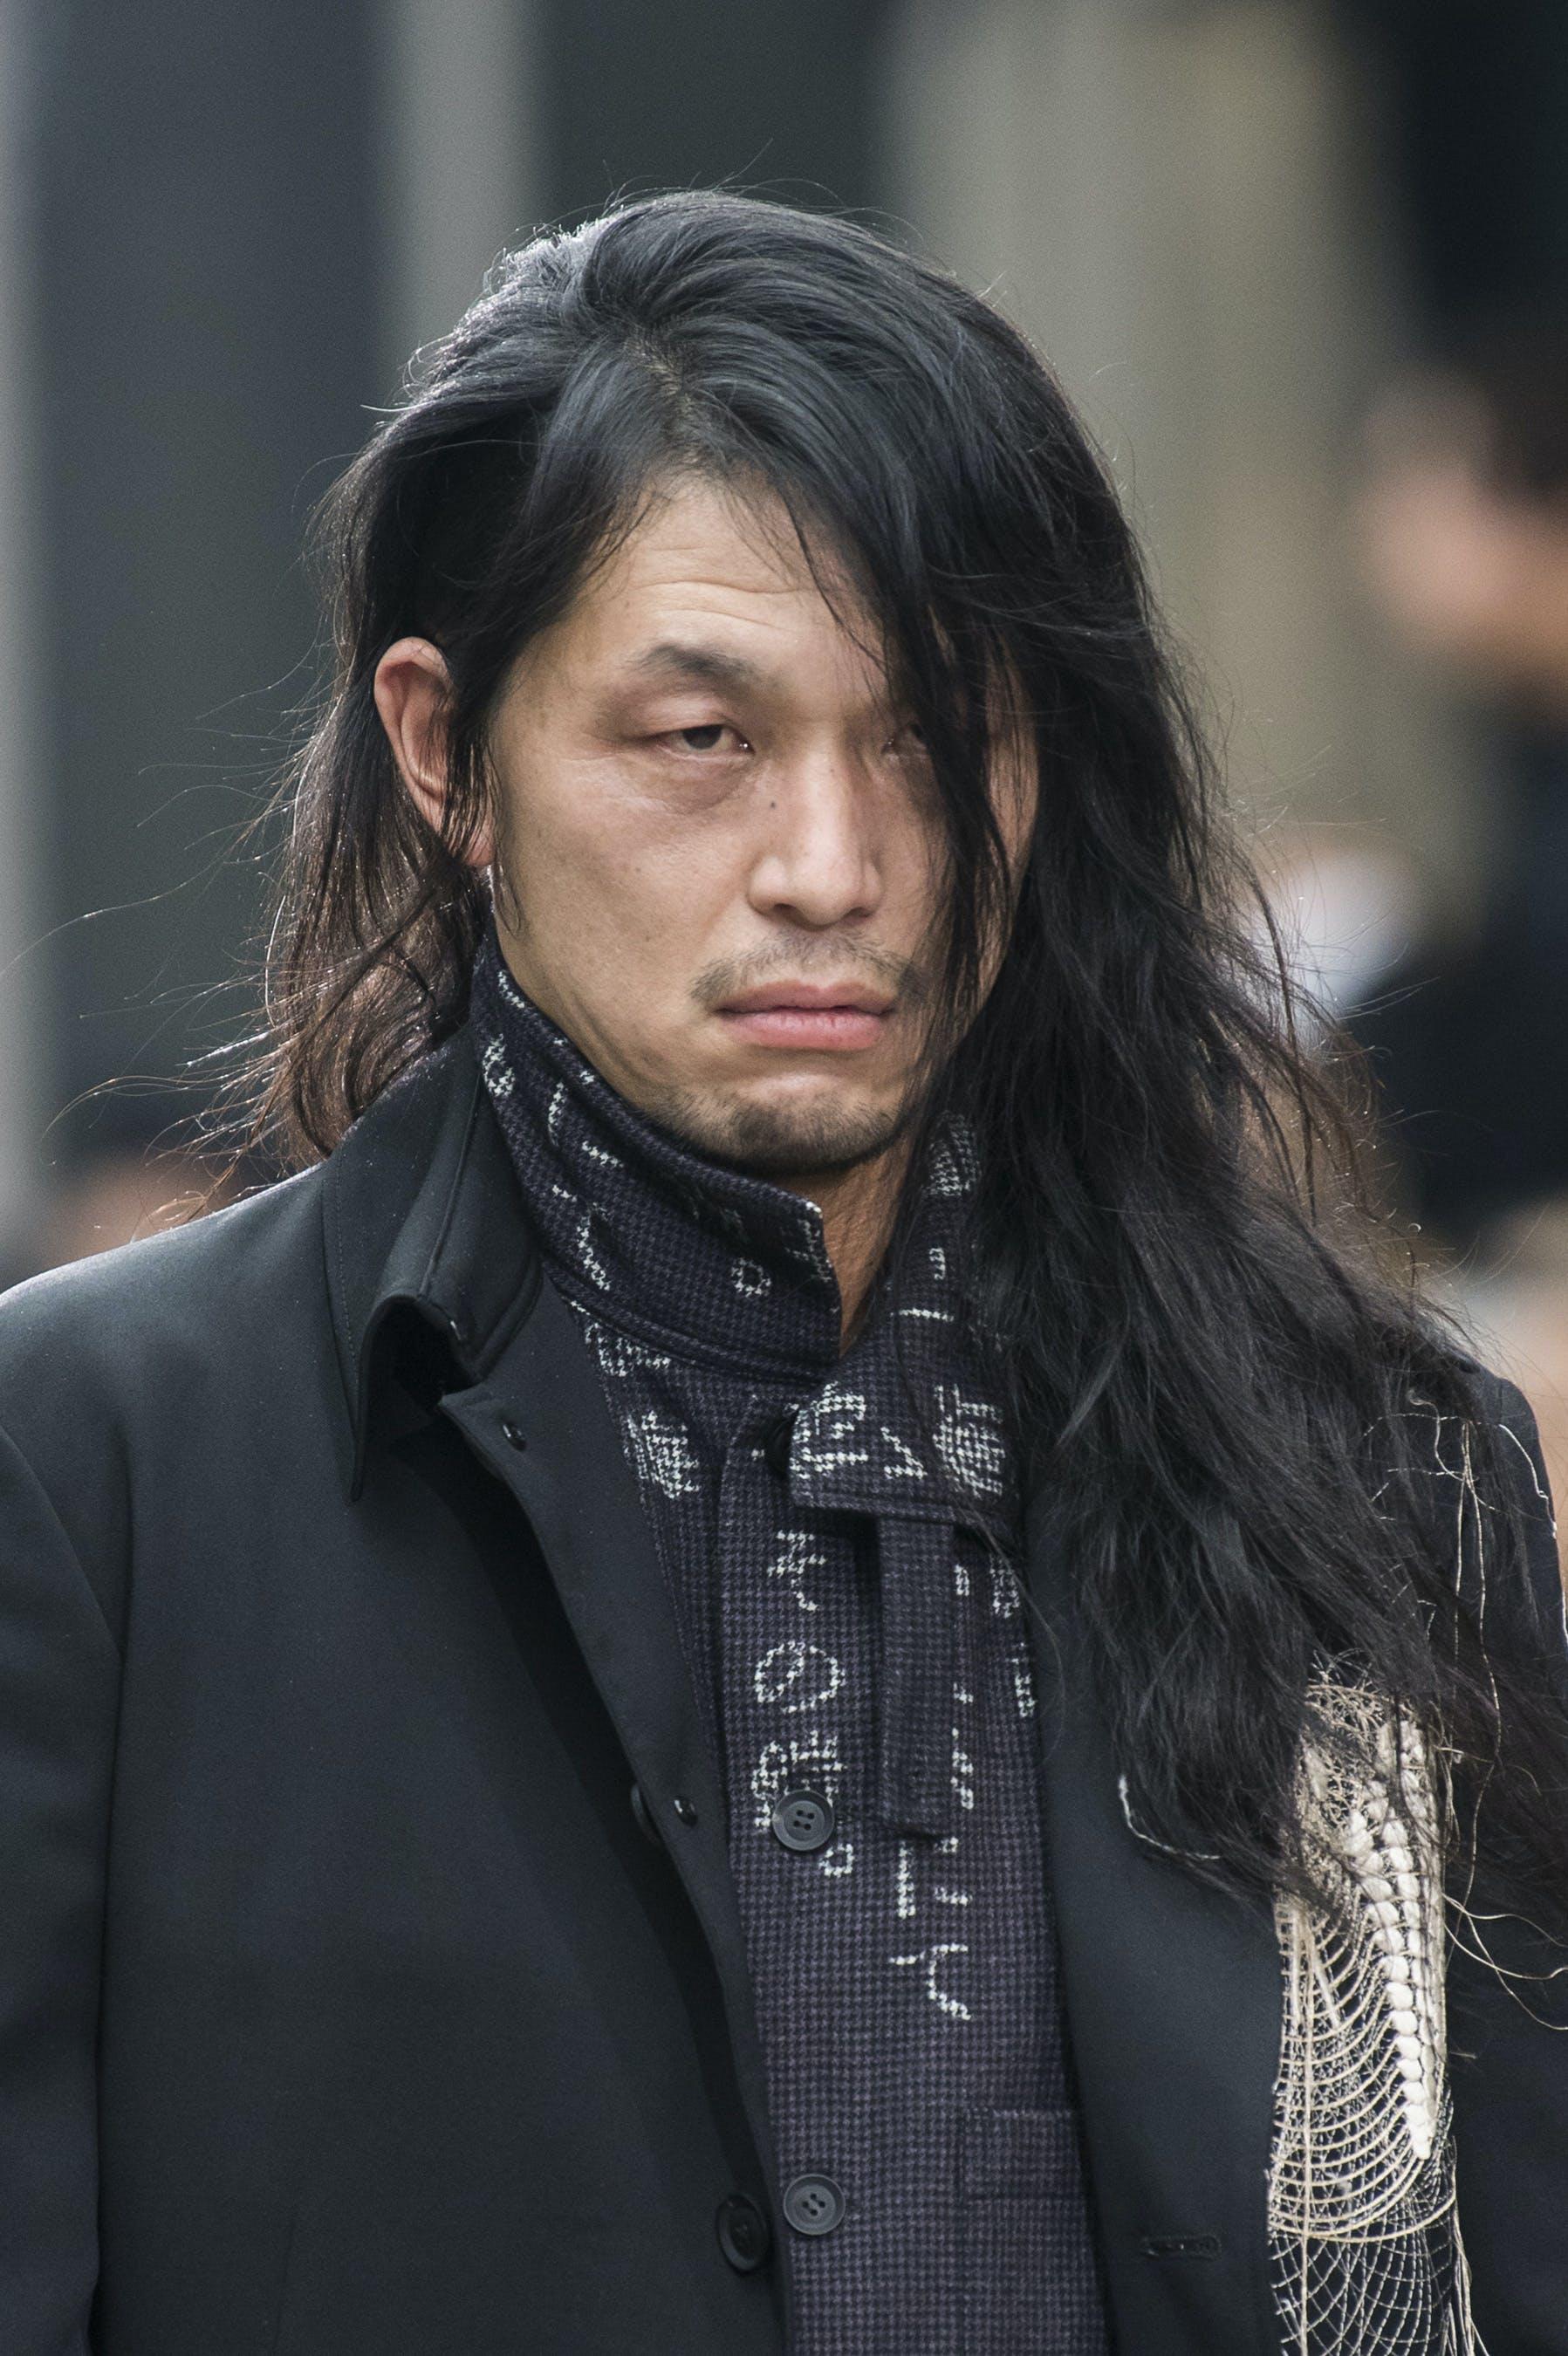 YOHJI YAMAMOTO MEN'S FALL 2019